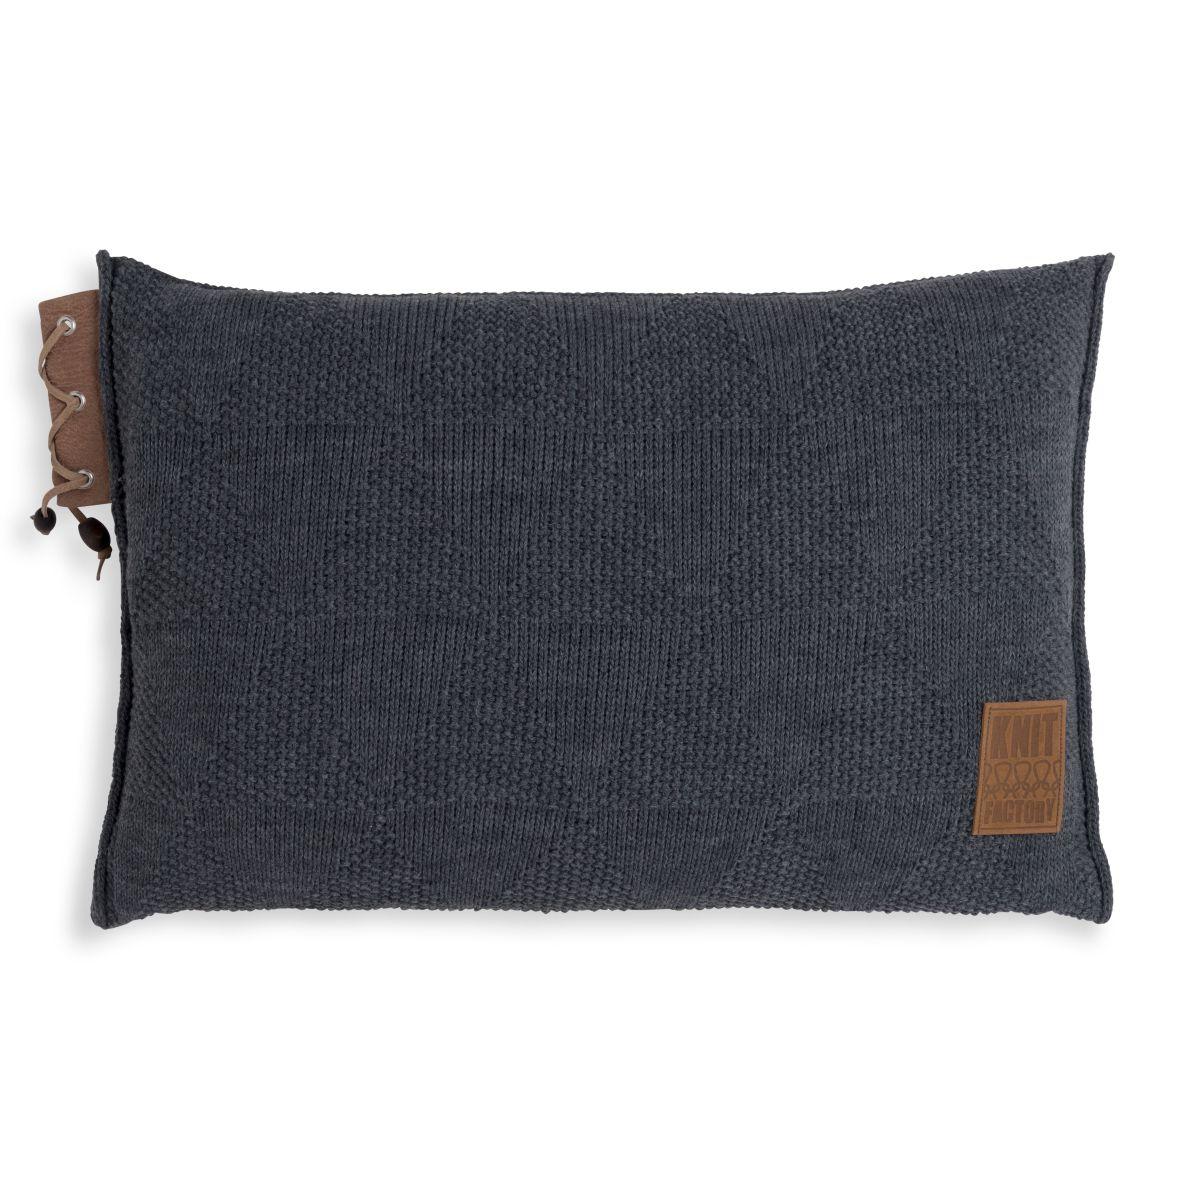 knit factory 1341310 jay kussen 60x40 antraciet 1